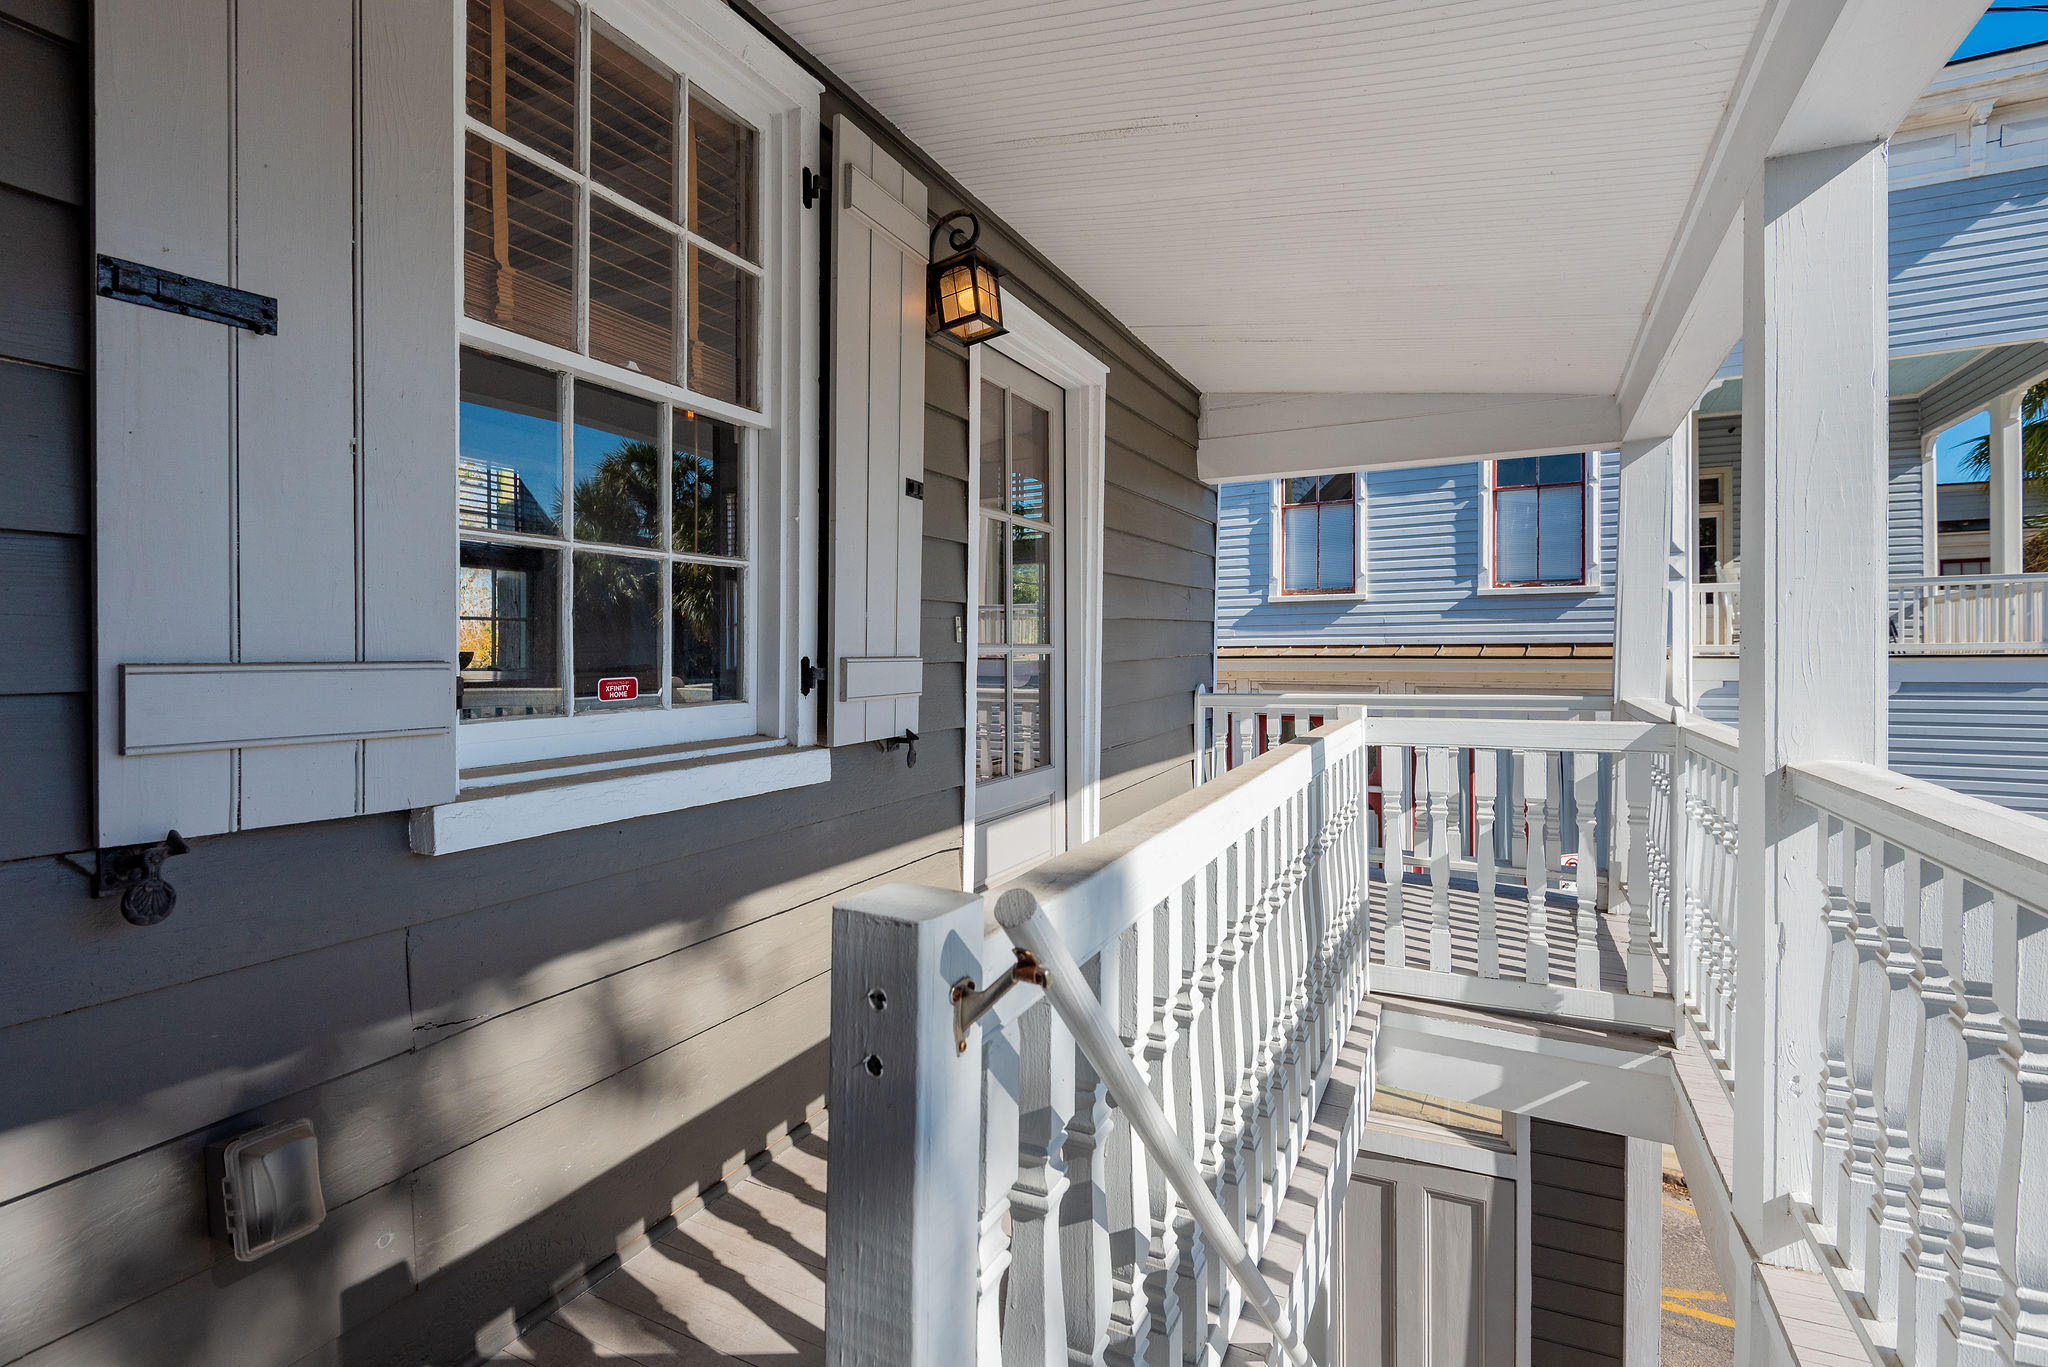 Elliotborough Homes For Sale - 29 Sires, Charleston, SC - 29